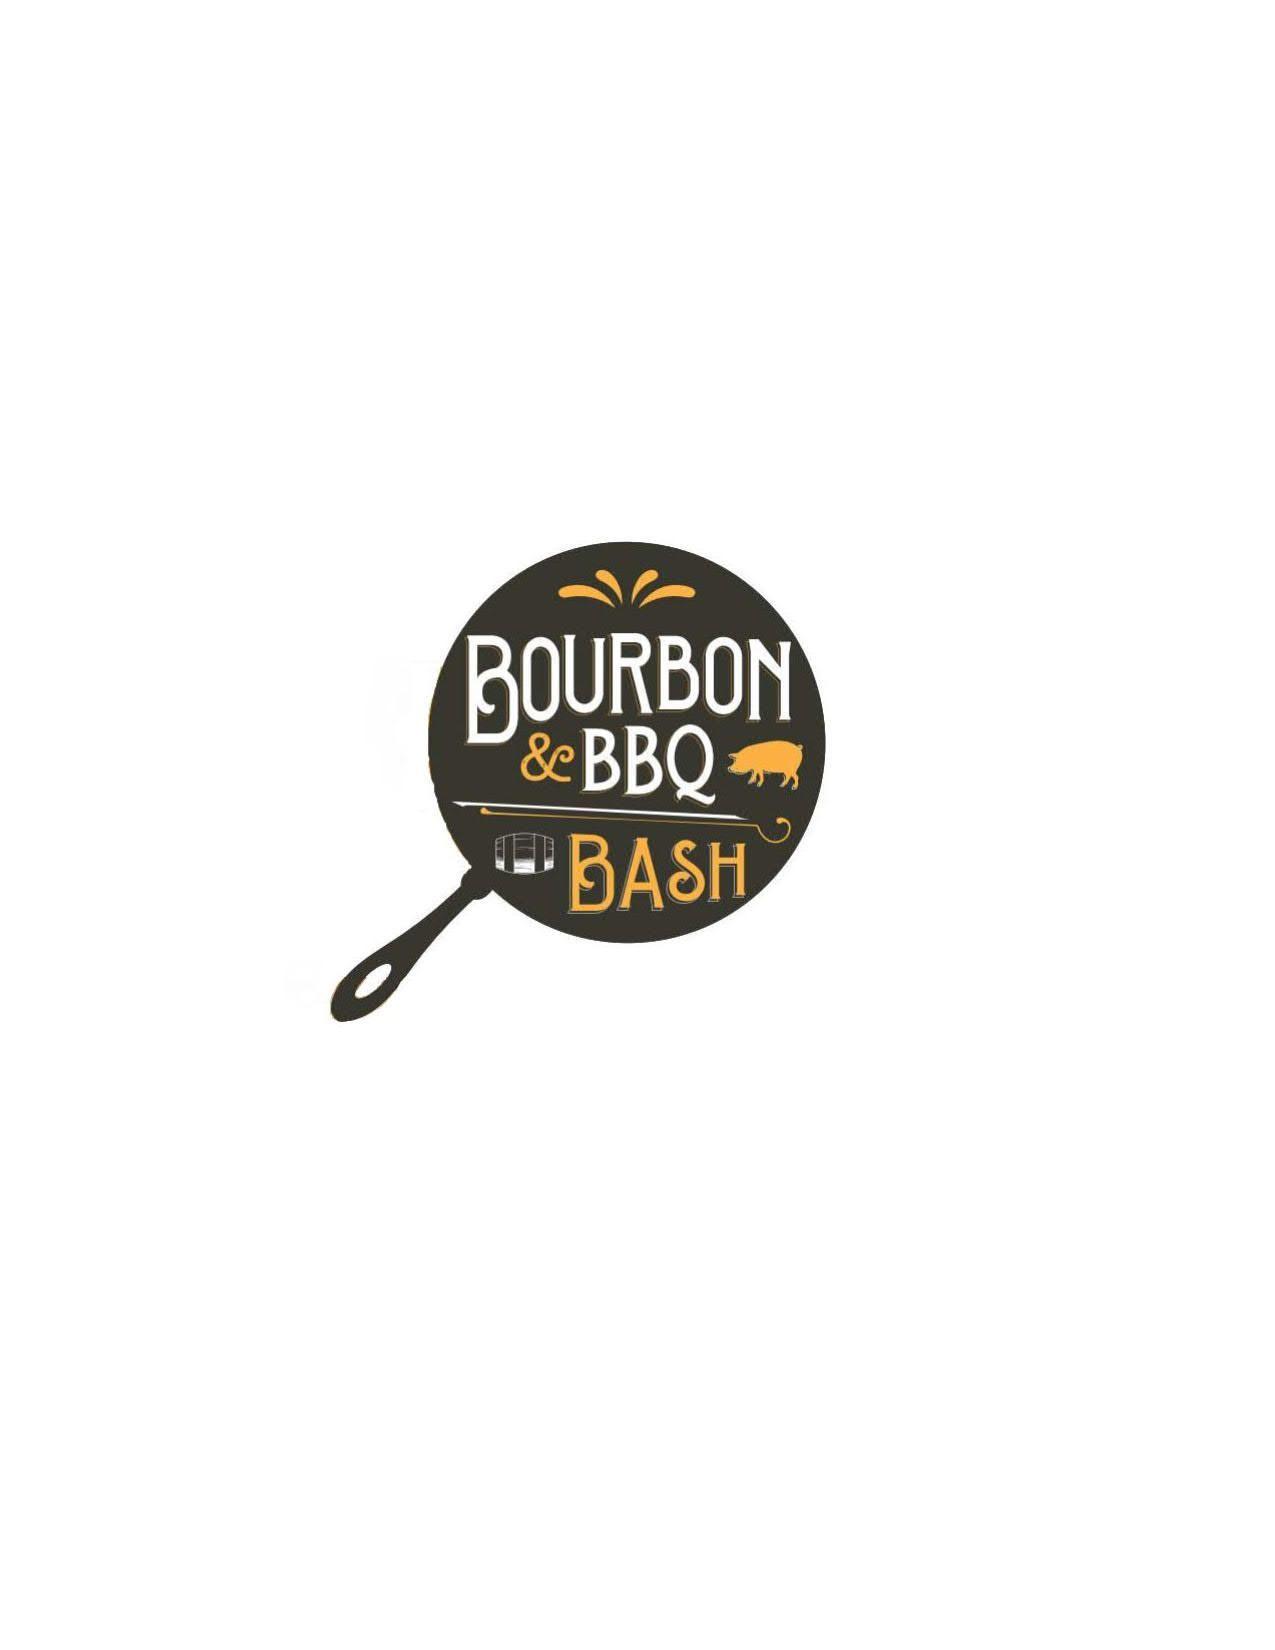 2021 Bourbon & BBQ Bash